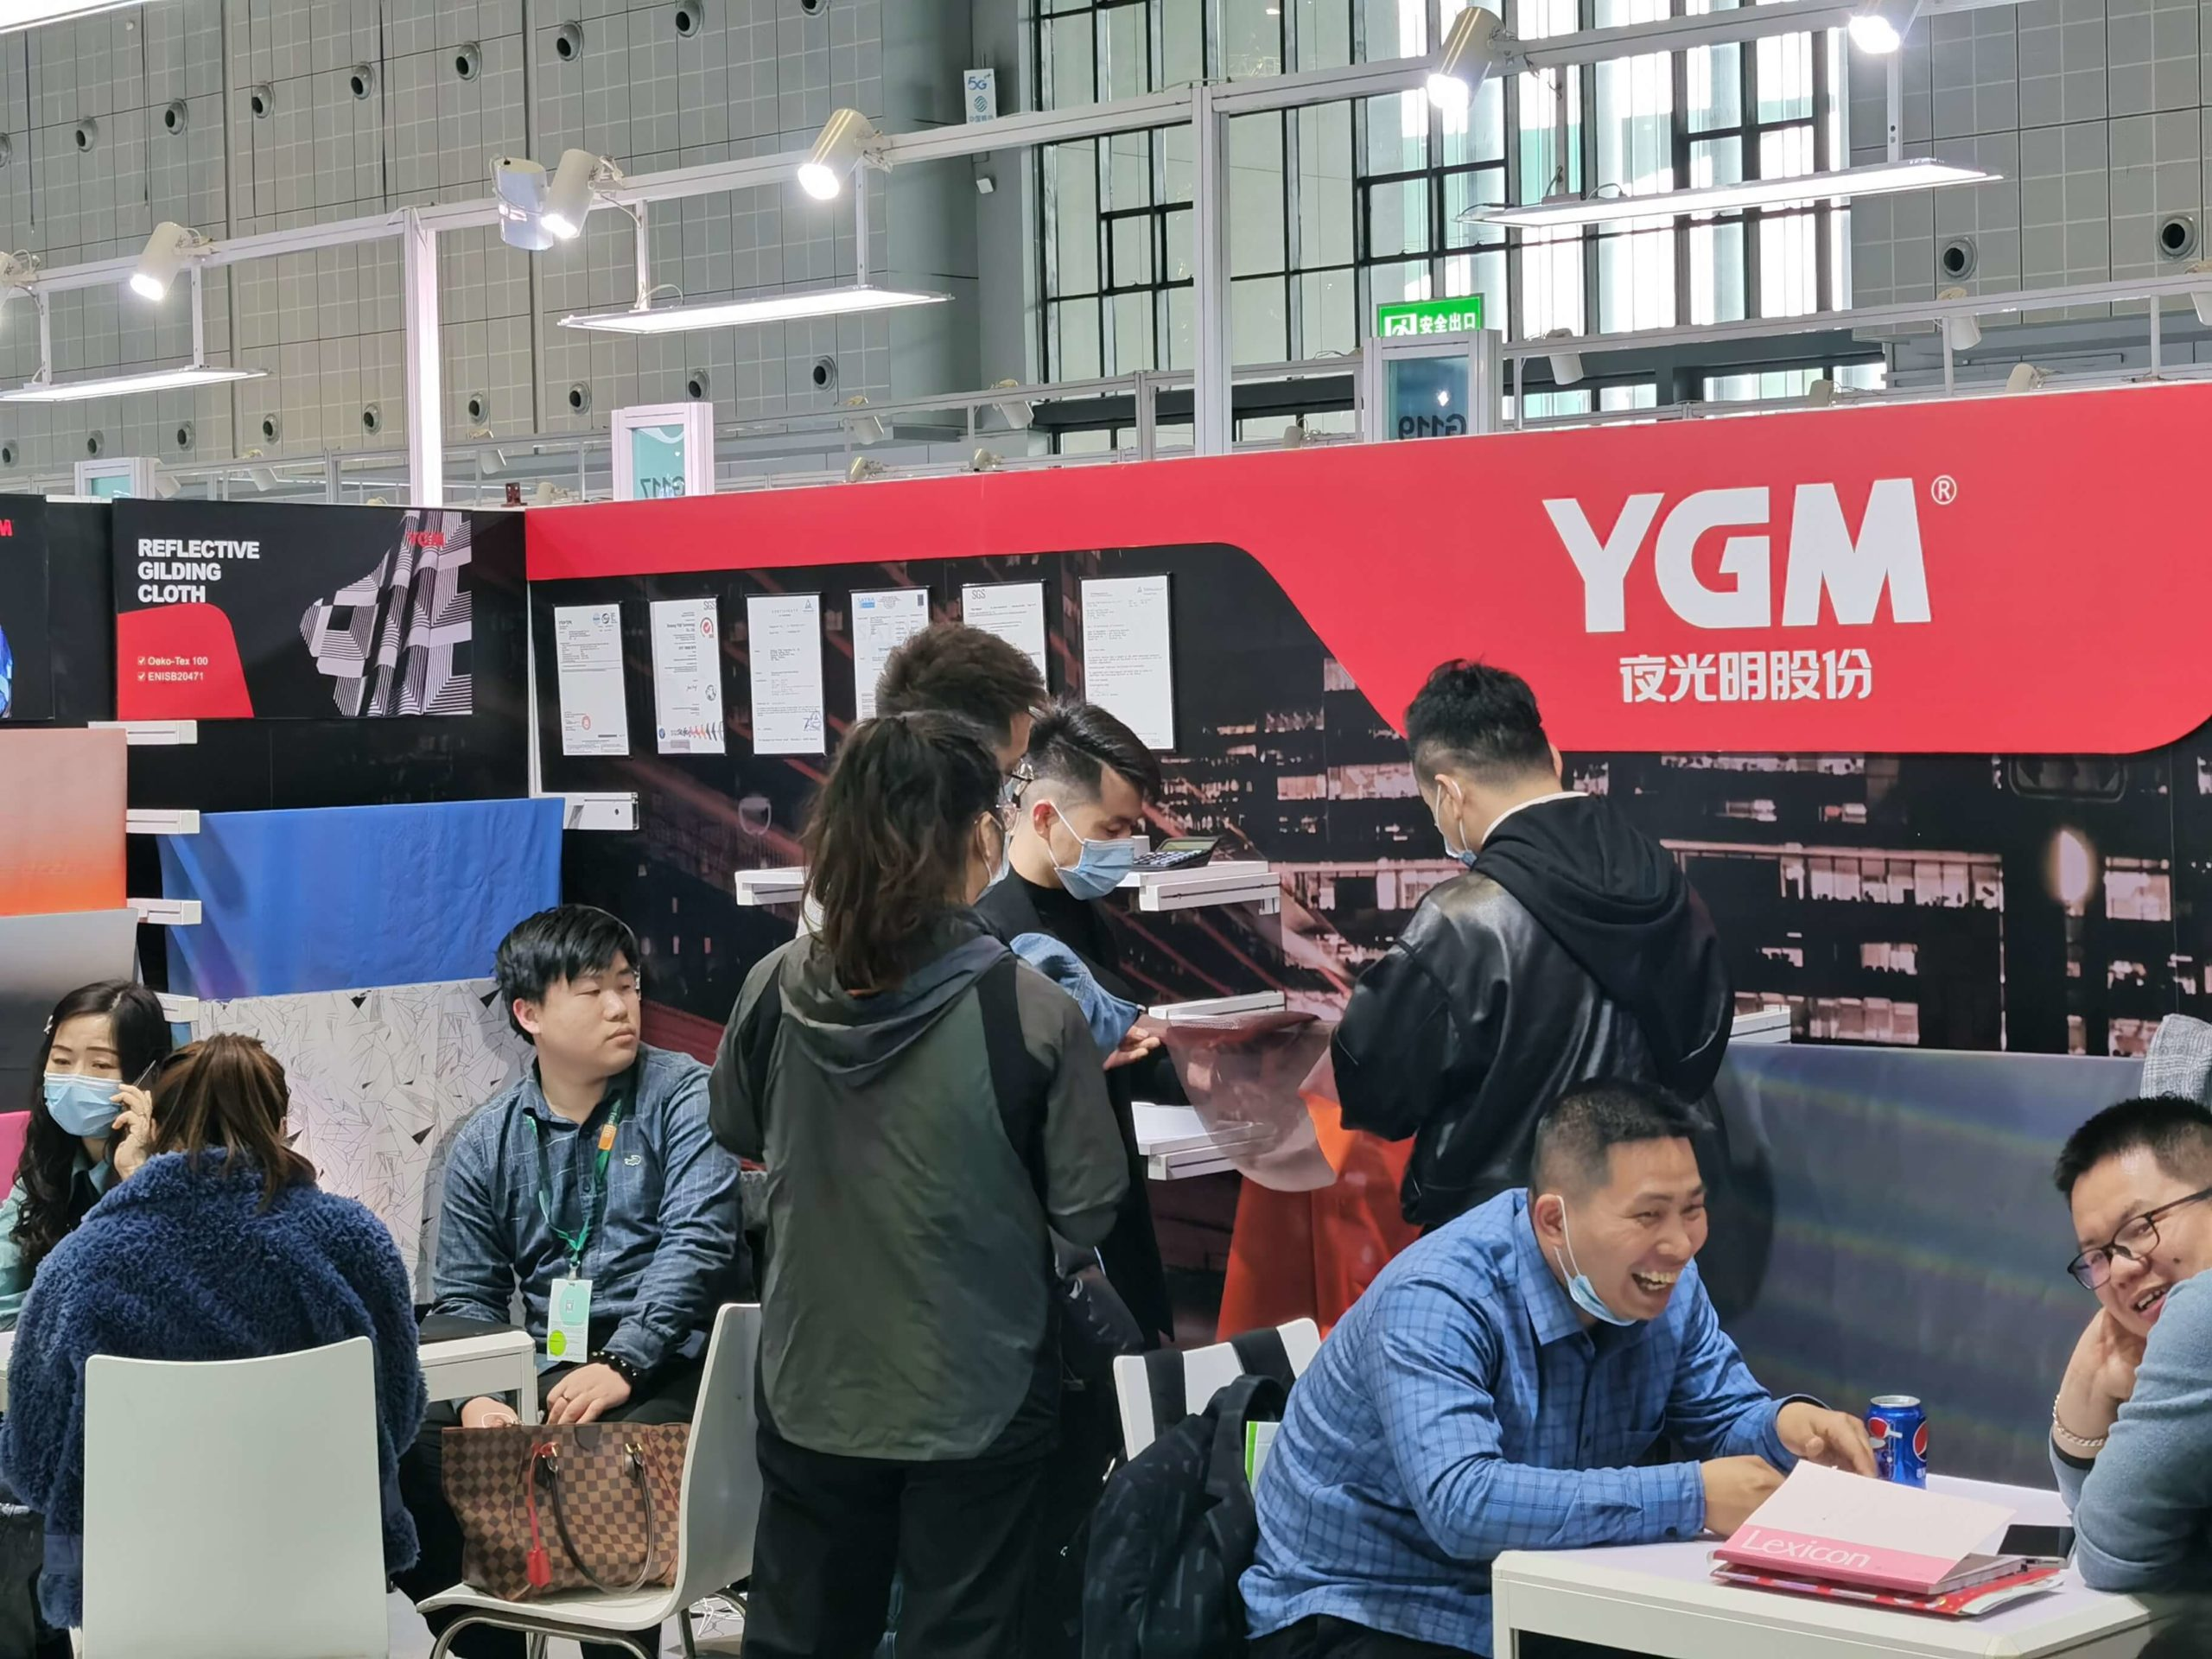 YGM reflective on intertextile2021 Trade Show (4)